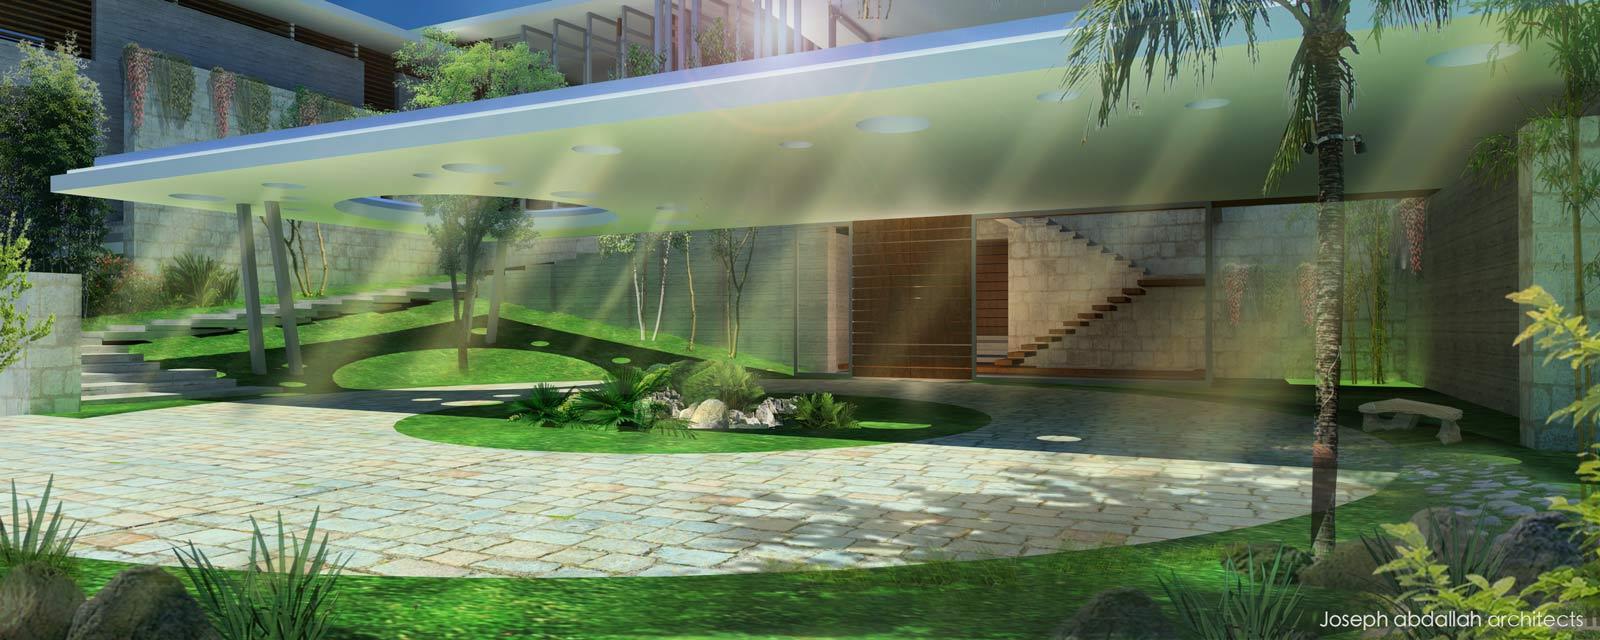 bakhos-nassif-mirror-pool-villa-lebanon-joseph-abdallah-architects-1